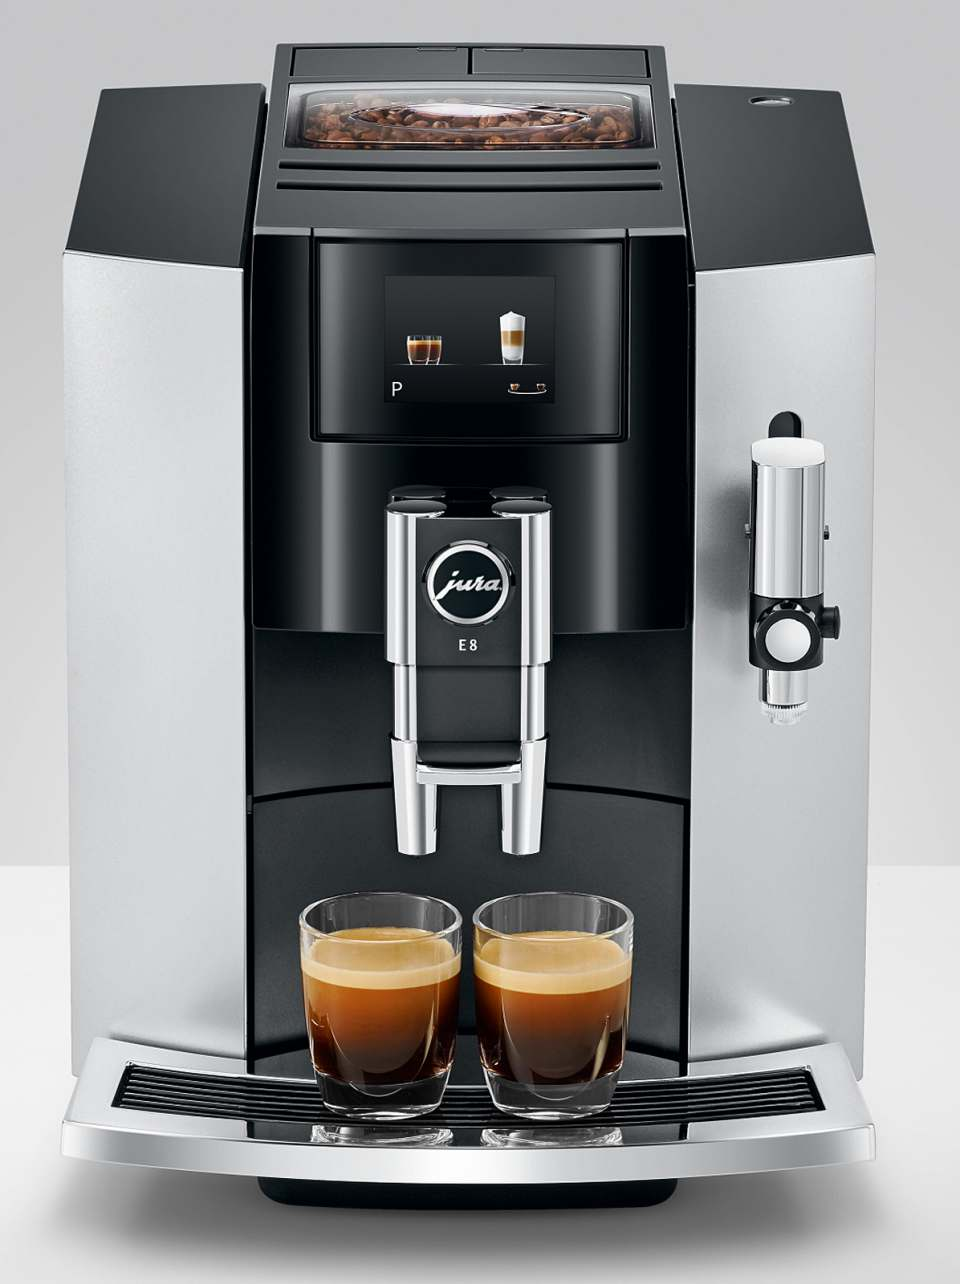 Jura Kaffeevollautomat E8 Modell 2019 . Upgrade für den Vollautomaten.